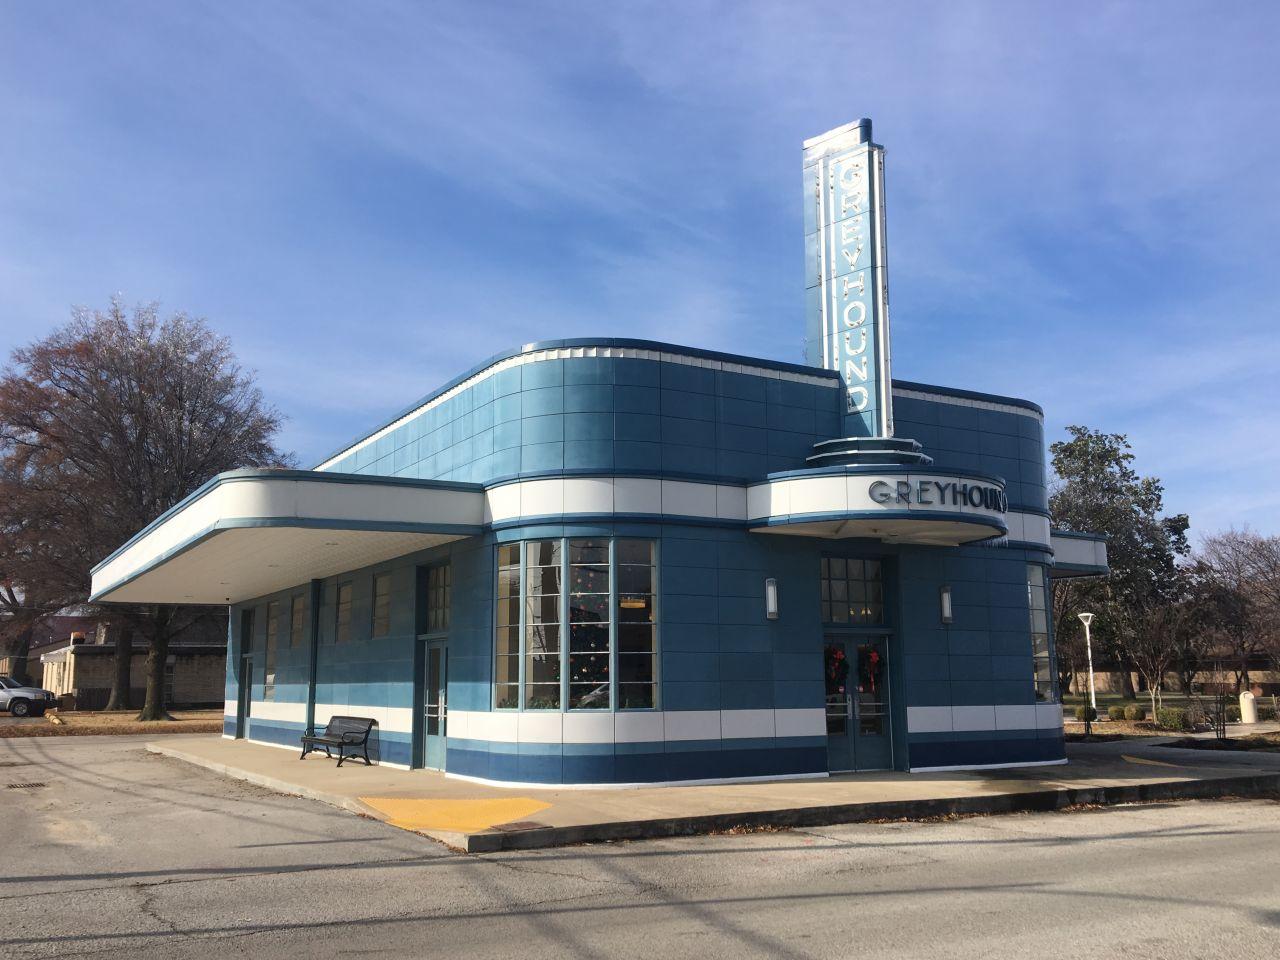 Aetn Chuck S Blog Exploring Arkansas February 2019